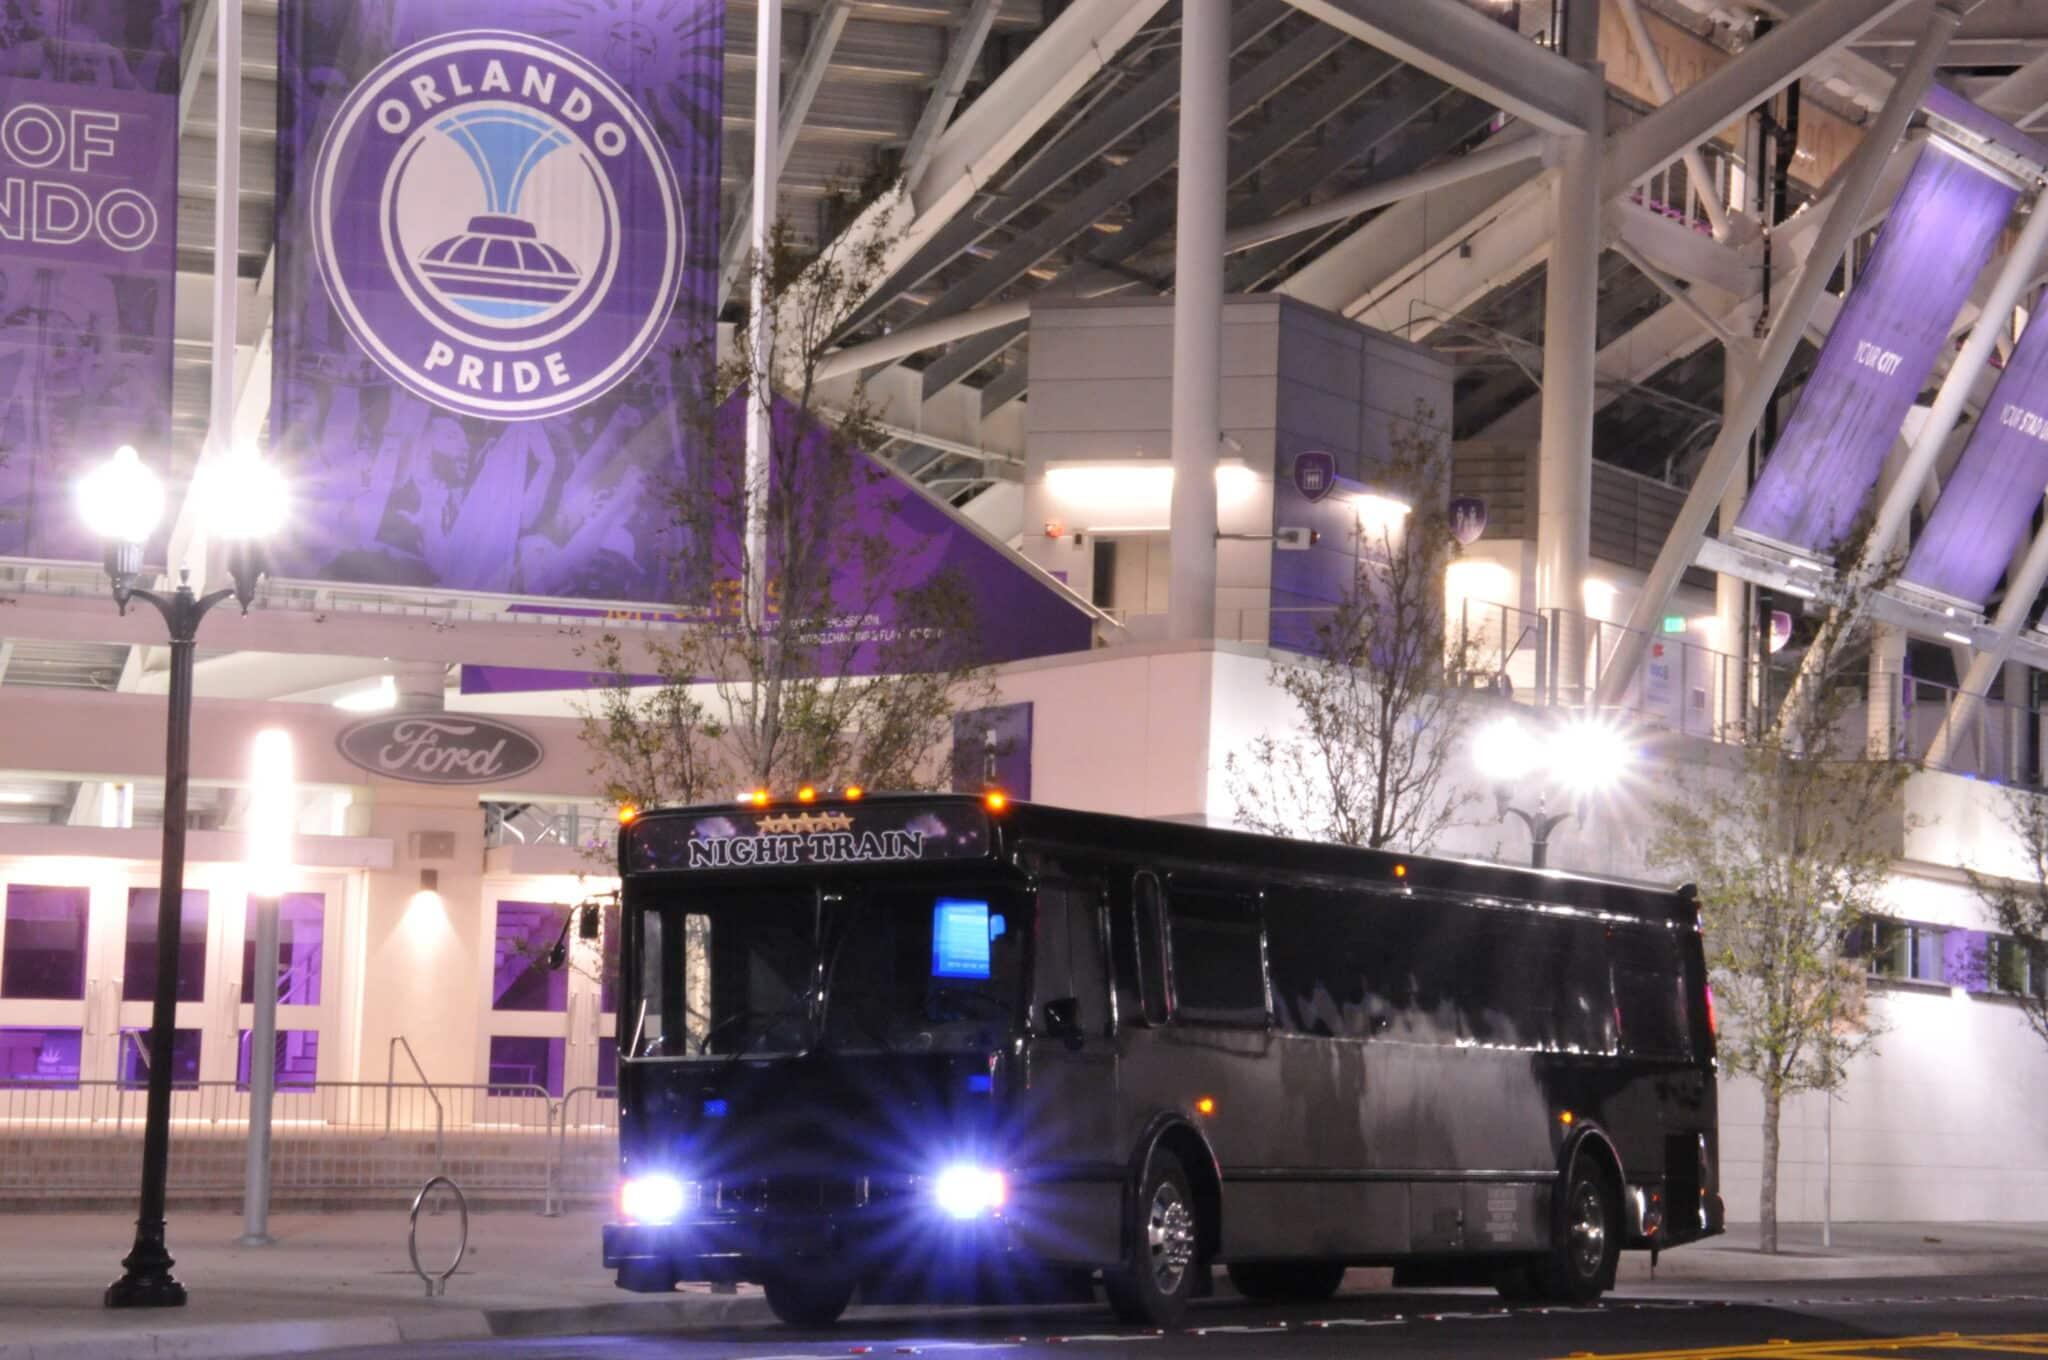 Night Train Party Bus Outside Orlando City